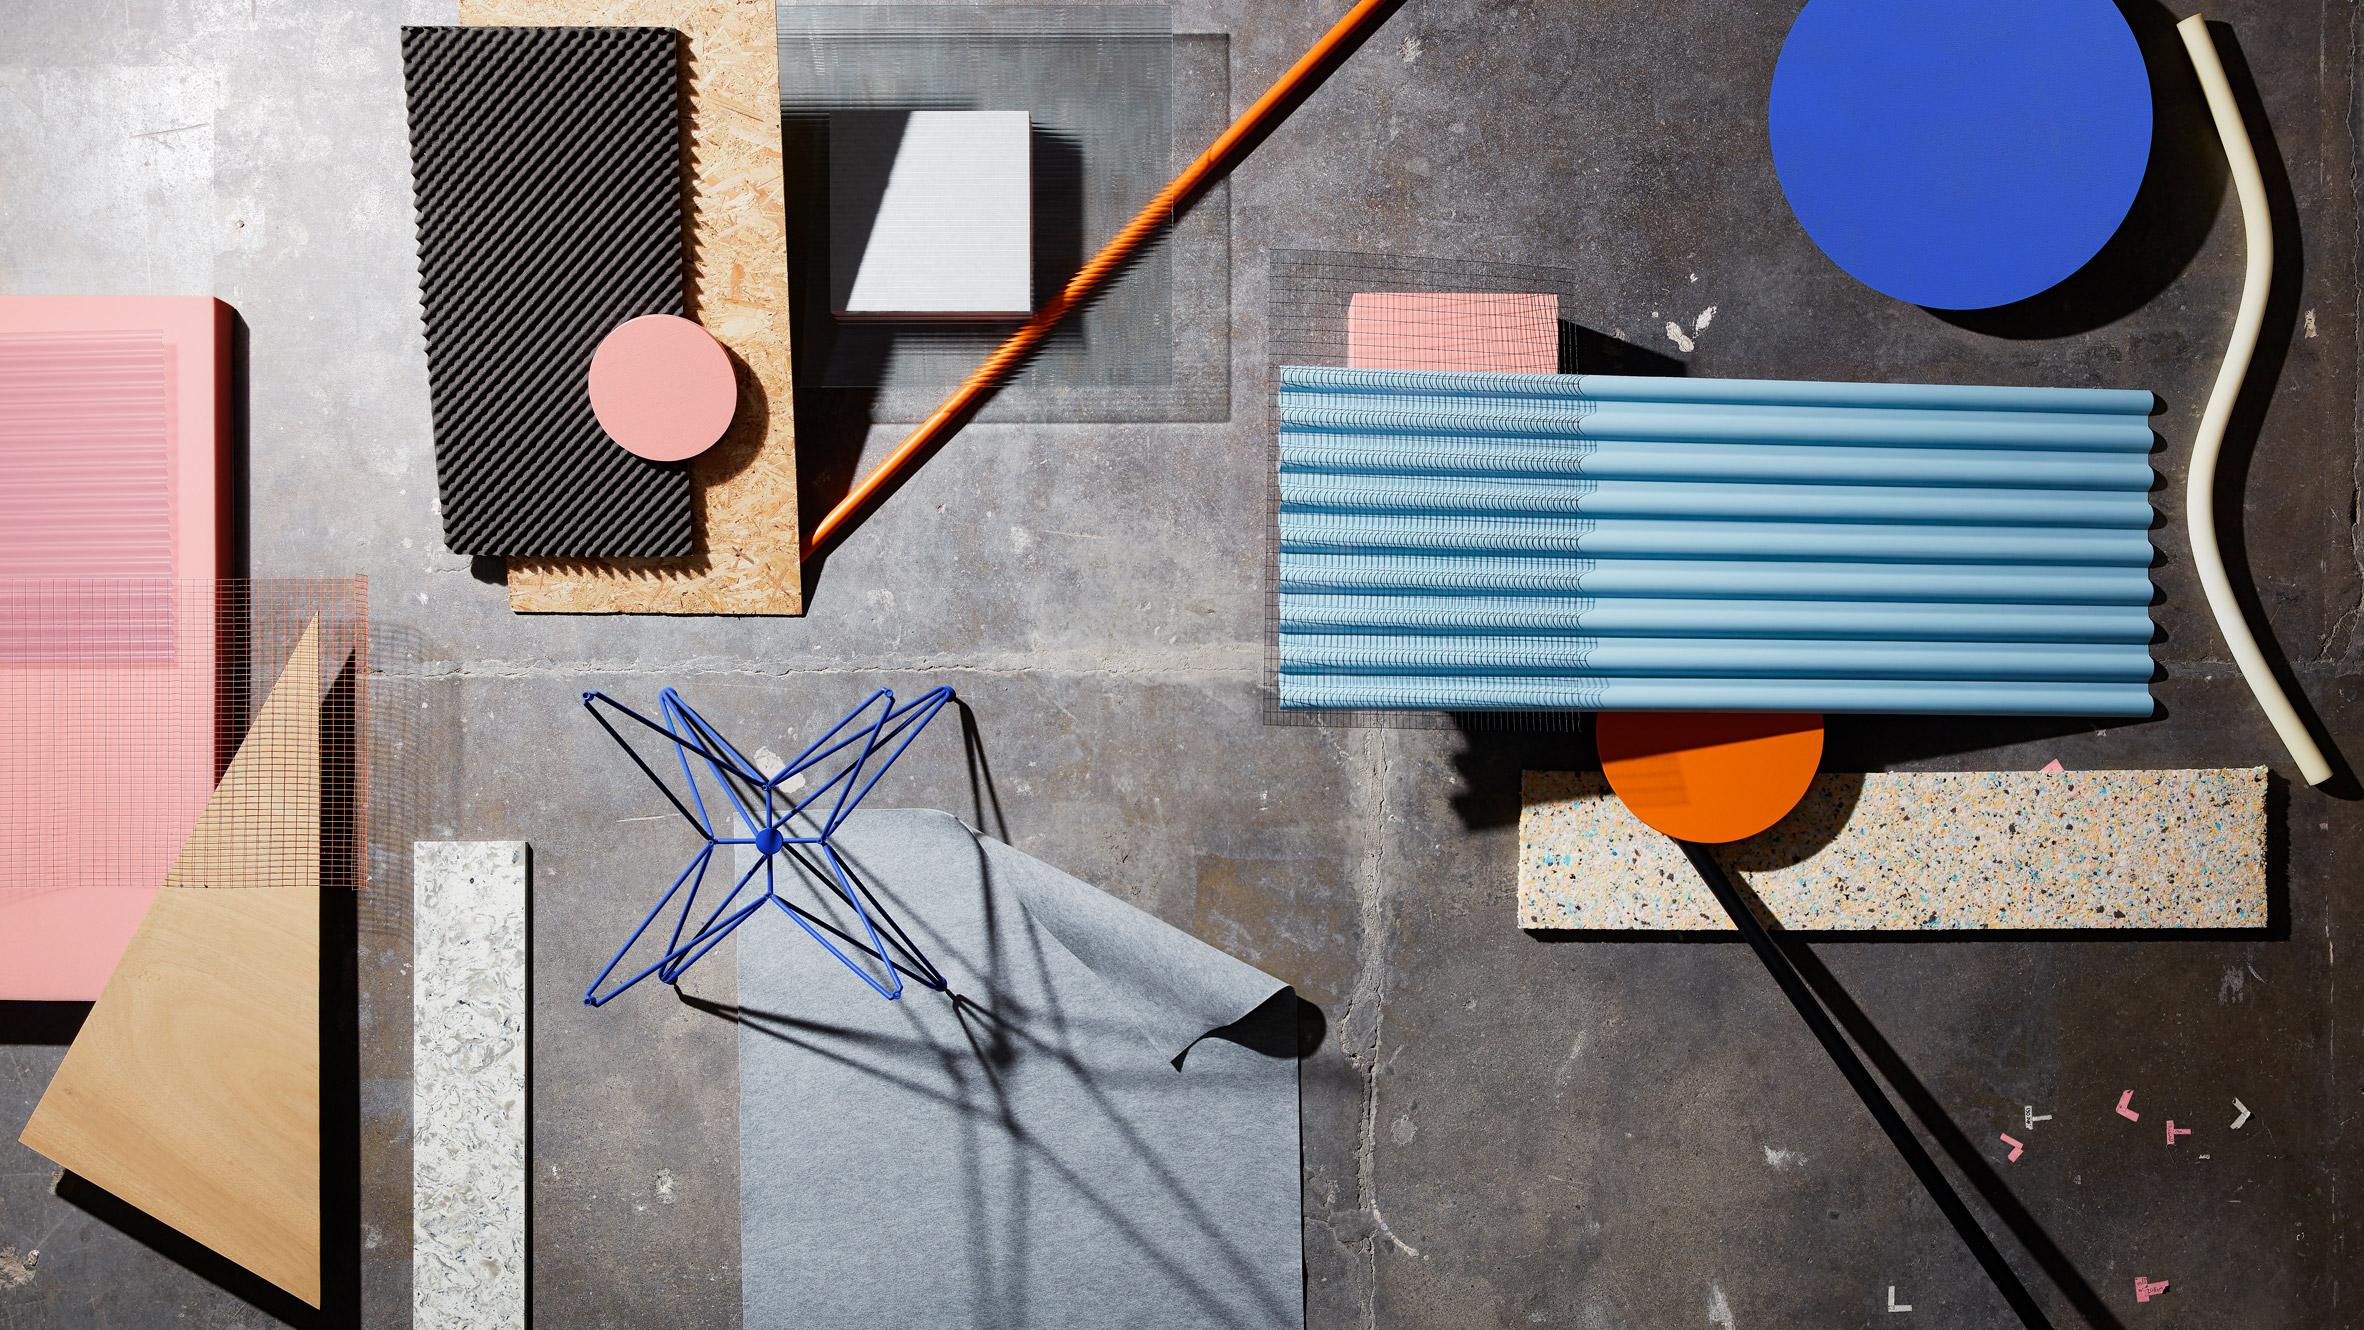 Madecom Launches Crowdsourcing Platform For Aspiring Designers - Crowdsourcing interior design